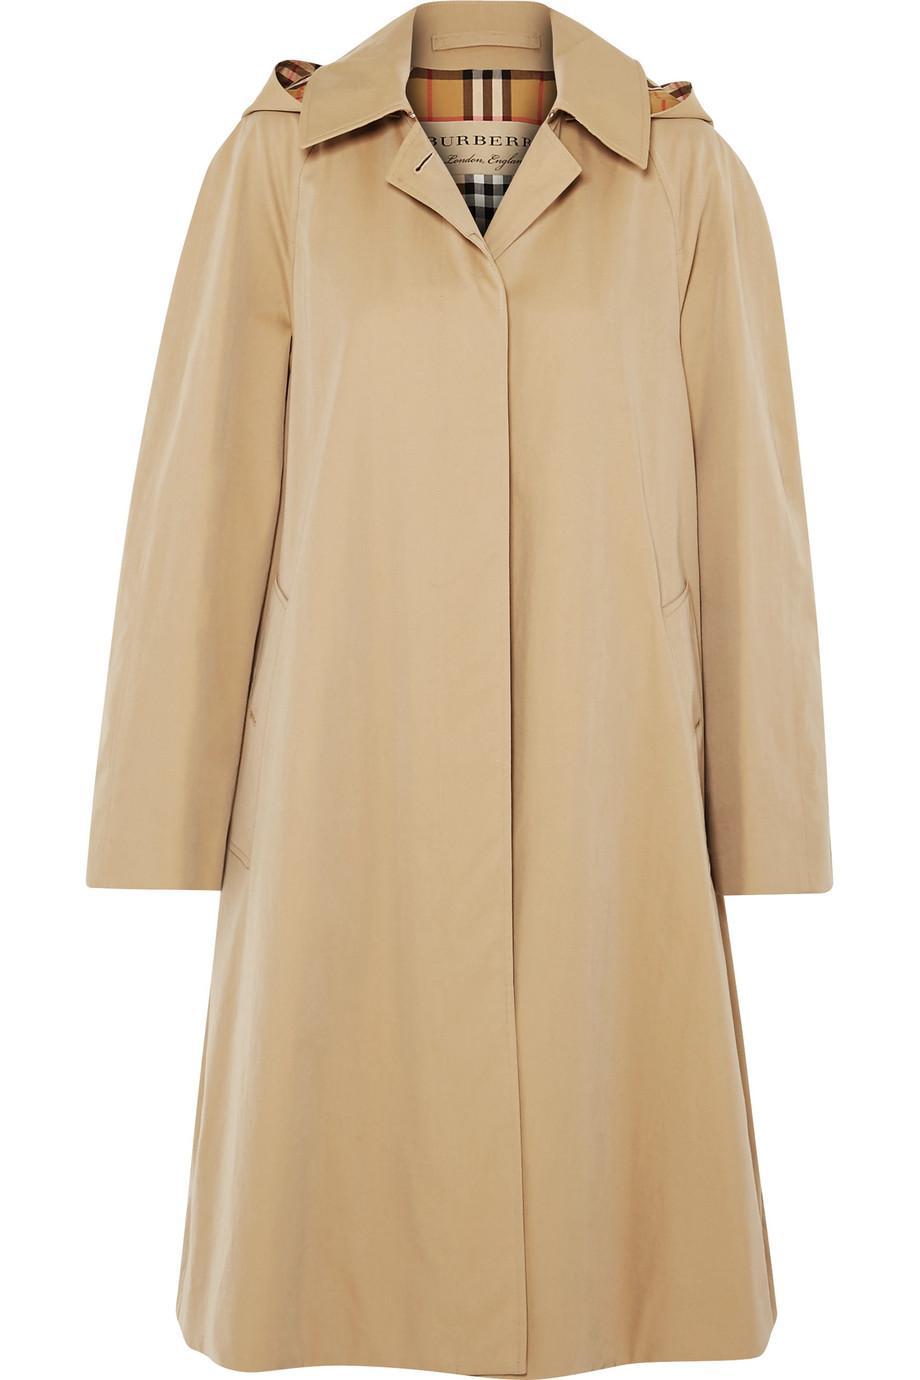 Safe Payment Outlet Order Online Oversized Hooded Cotton-gabardine Trench Coat - Beige Burberry g3MhSOa